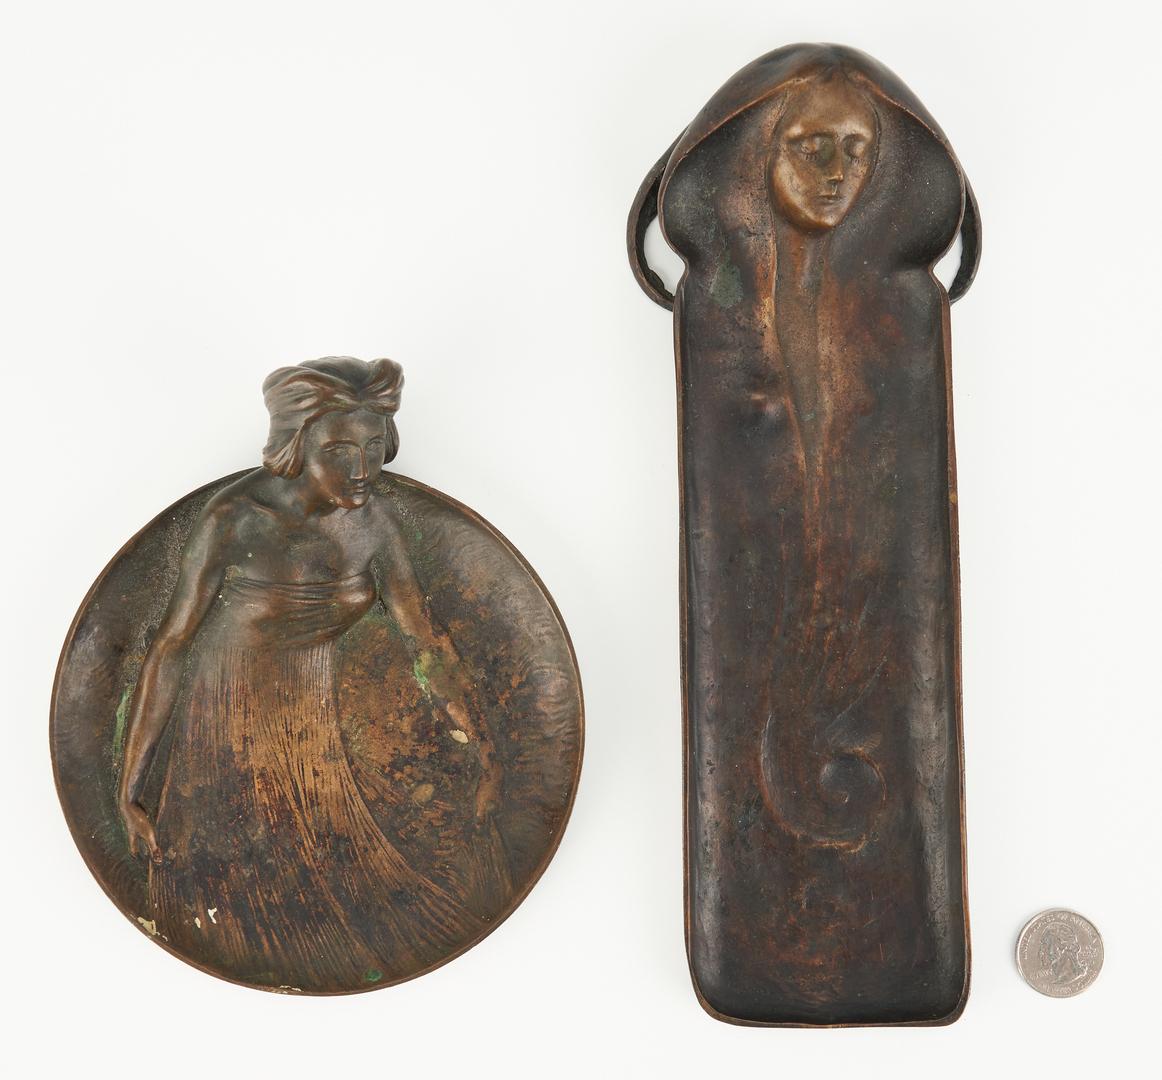 Lot 976: Three (3) European Bronzes, incl. Gurschner & Grasegger